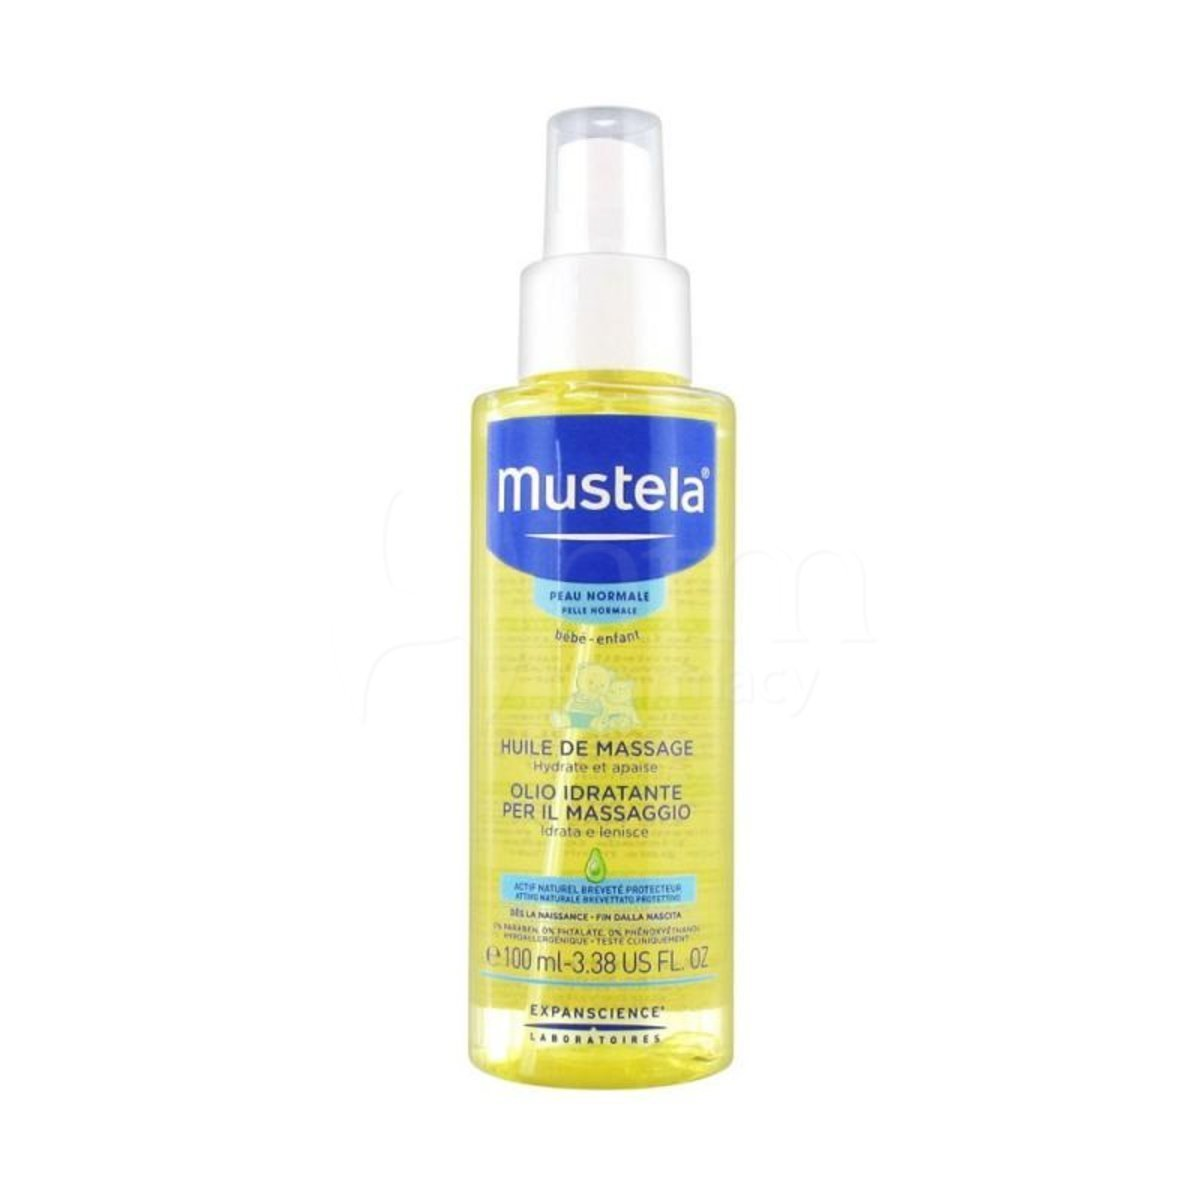 Mustela - Baby Massage Oil 100ml [Parallel Import]